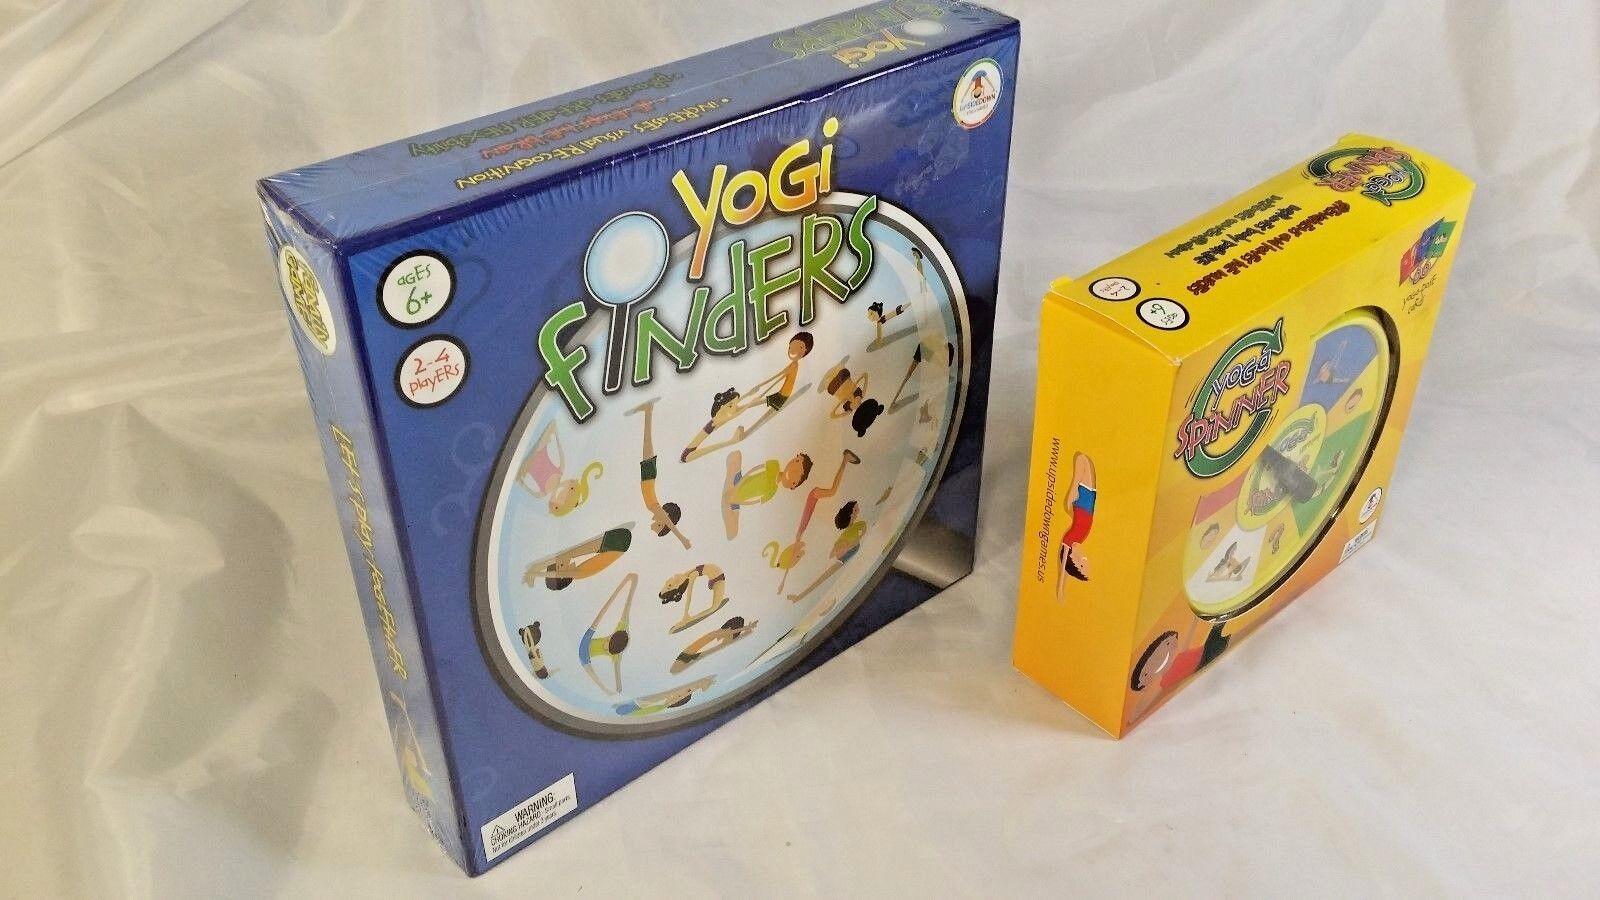 2 New UpsideDown Yoga Games YOGA SPINNER & YOGI FINDER Strengthen Mind & Body